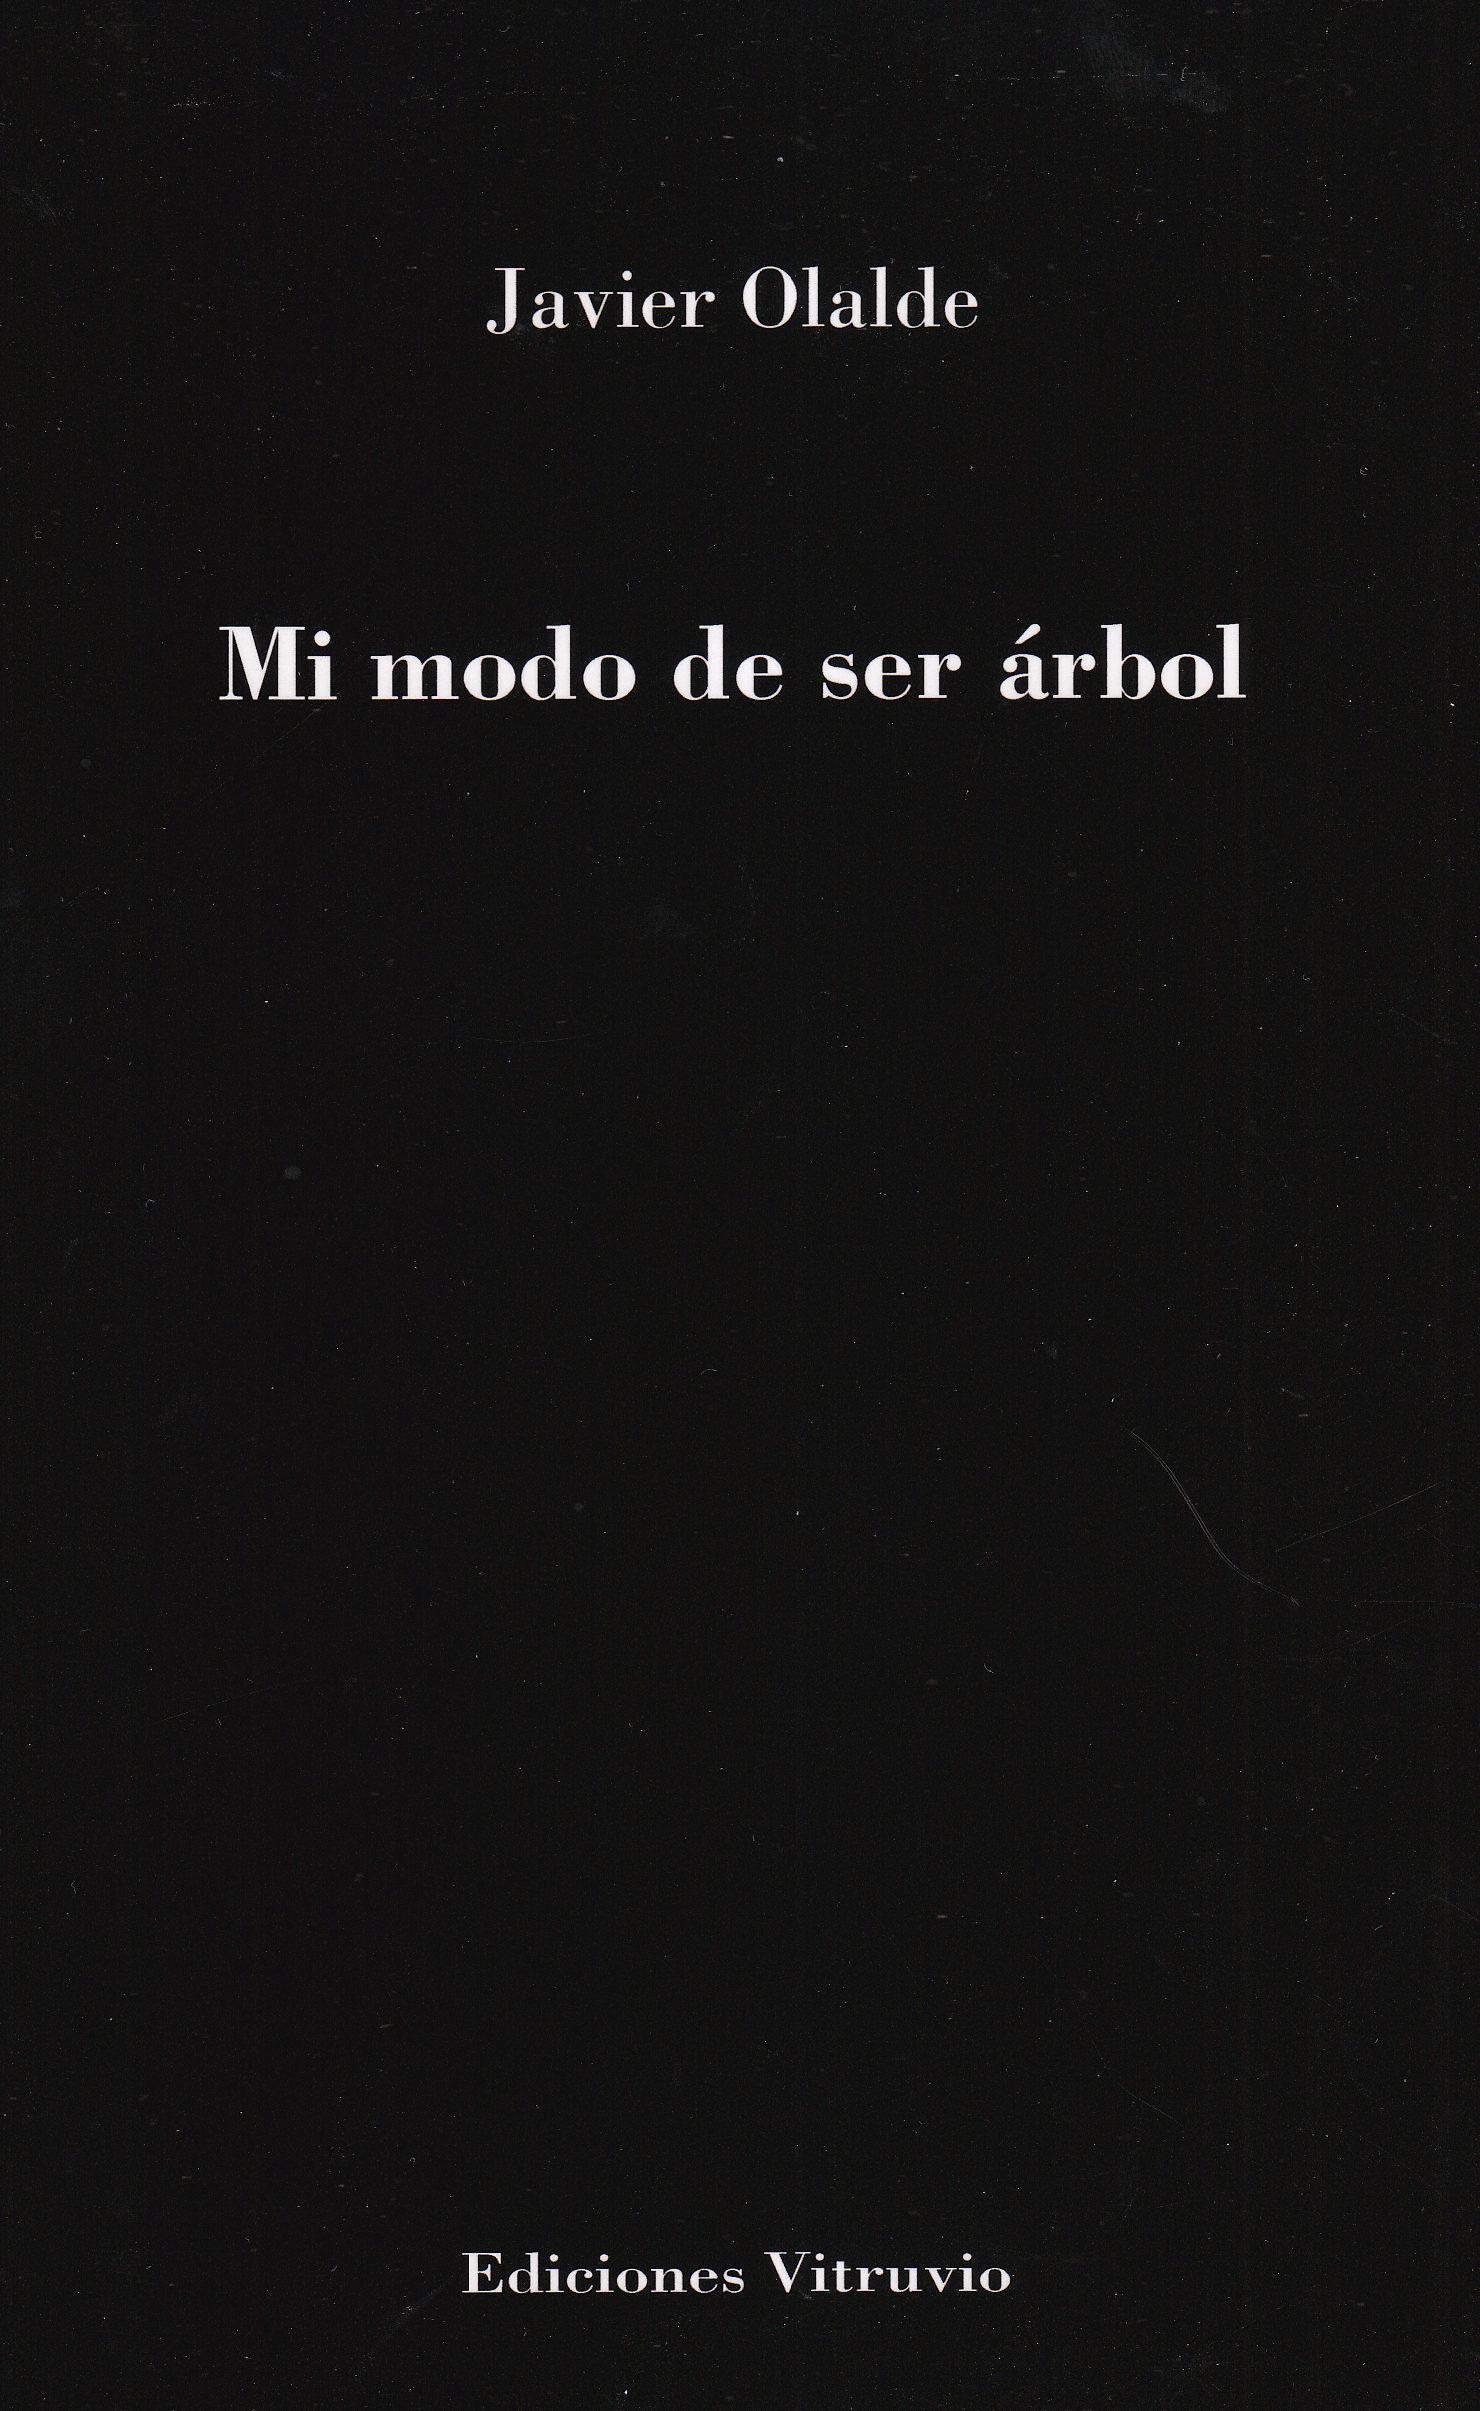 mi modo de ser Árbol - Mimododeserarbol - MI MODO DE SER ÁRBOL libros recomendados - Mimododeserarbol - Libros recomendados